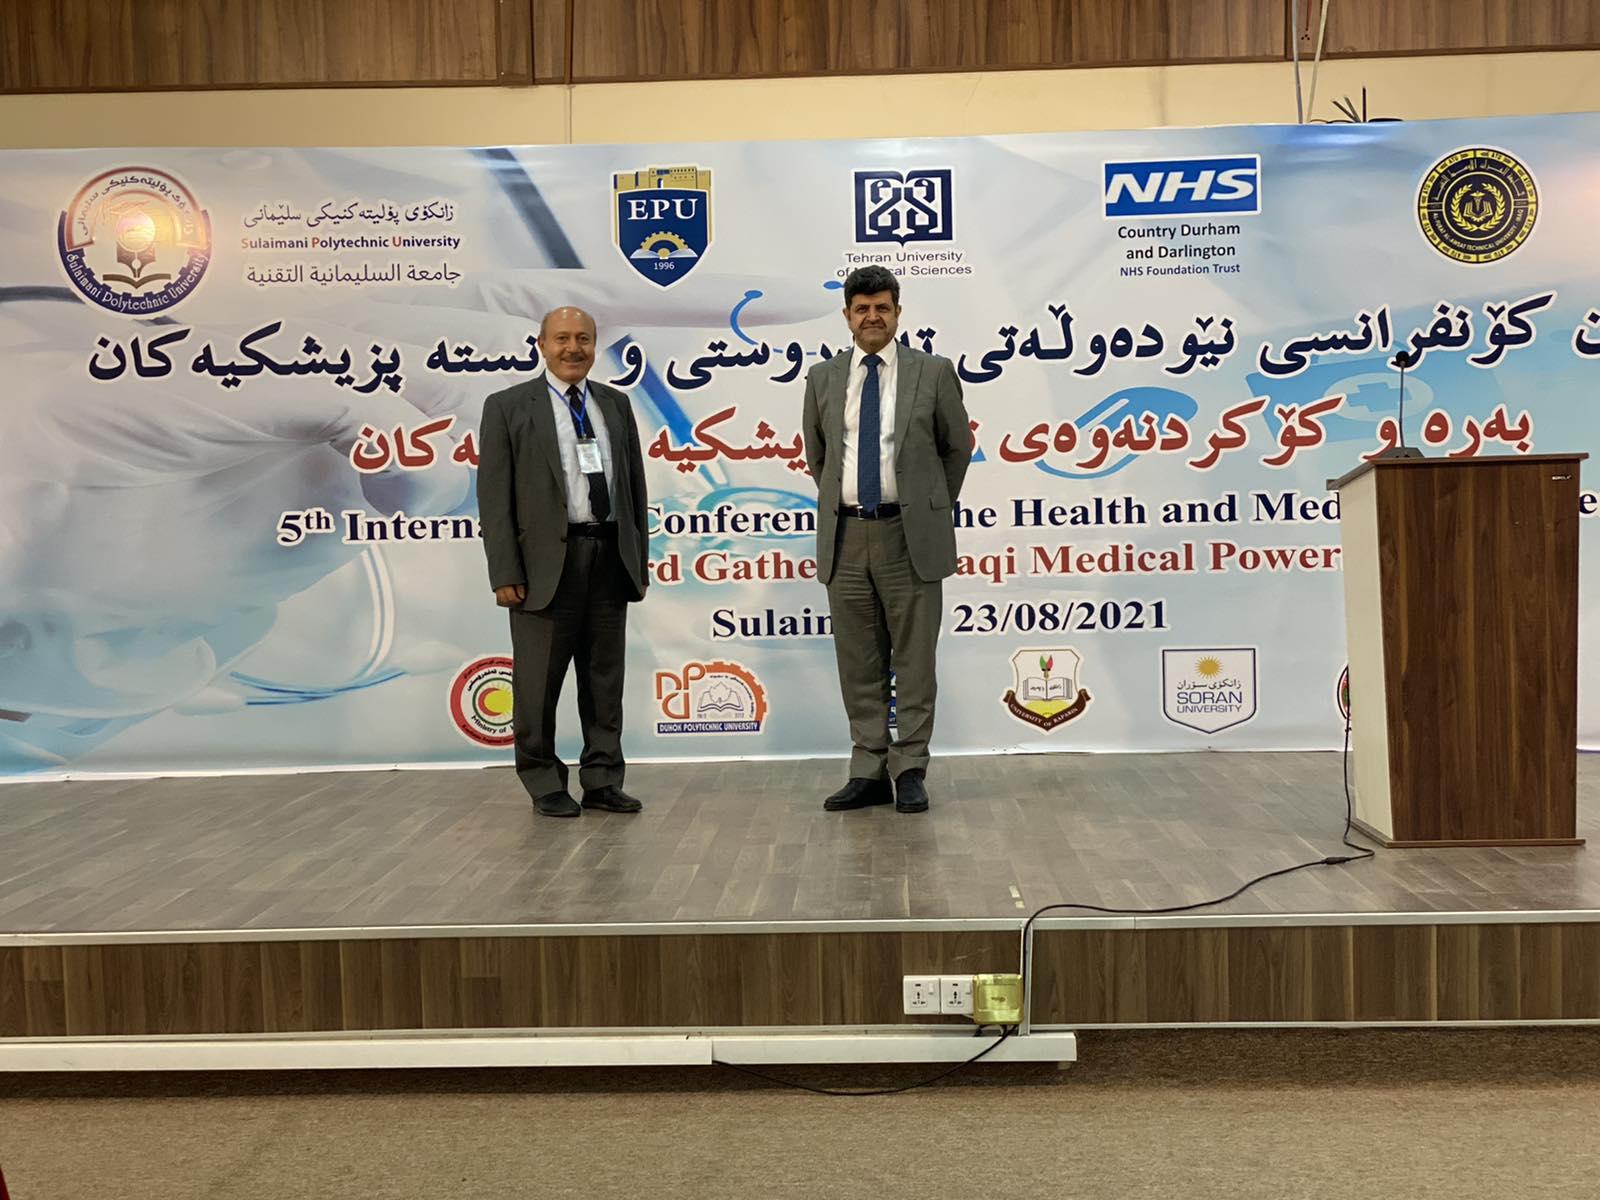 Erbil Polytechnic University In Partnership With Sulaimaniyah Polytechnic University Will Manage An International Scientific Conference